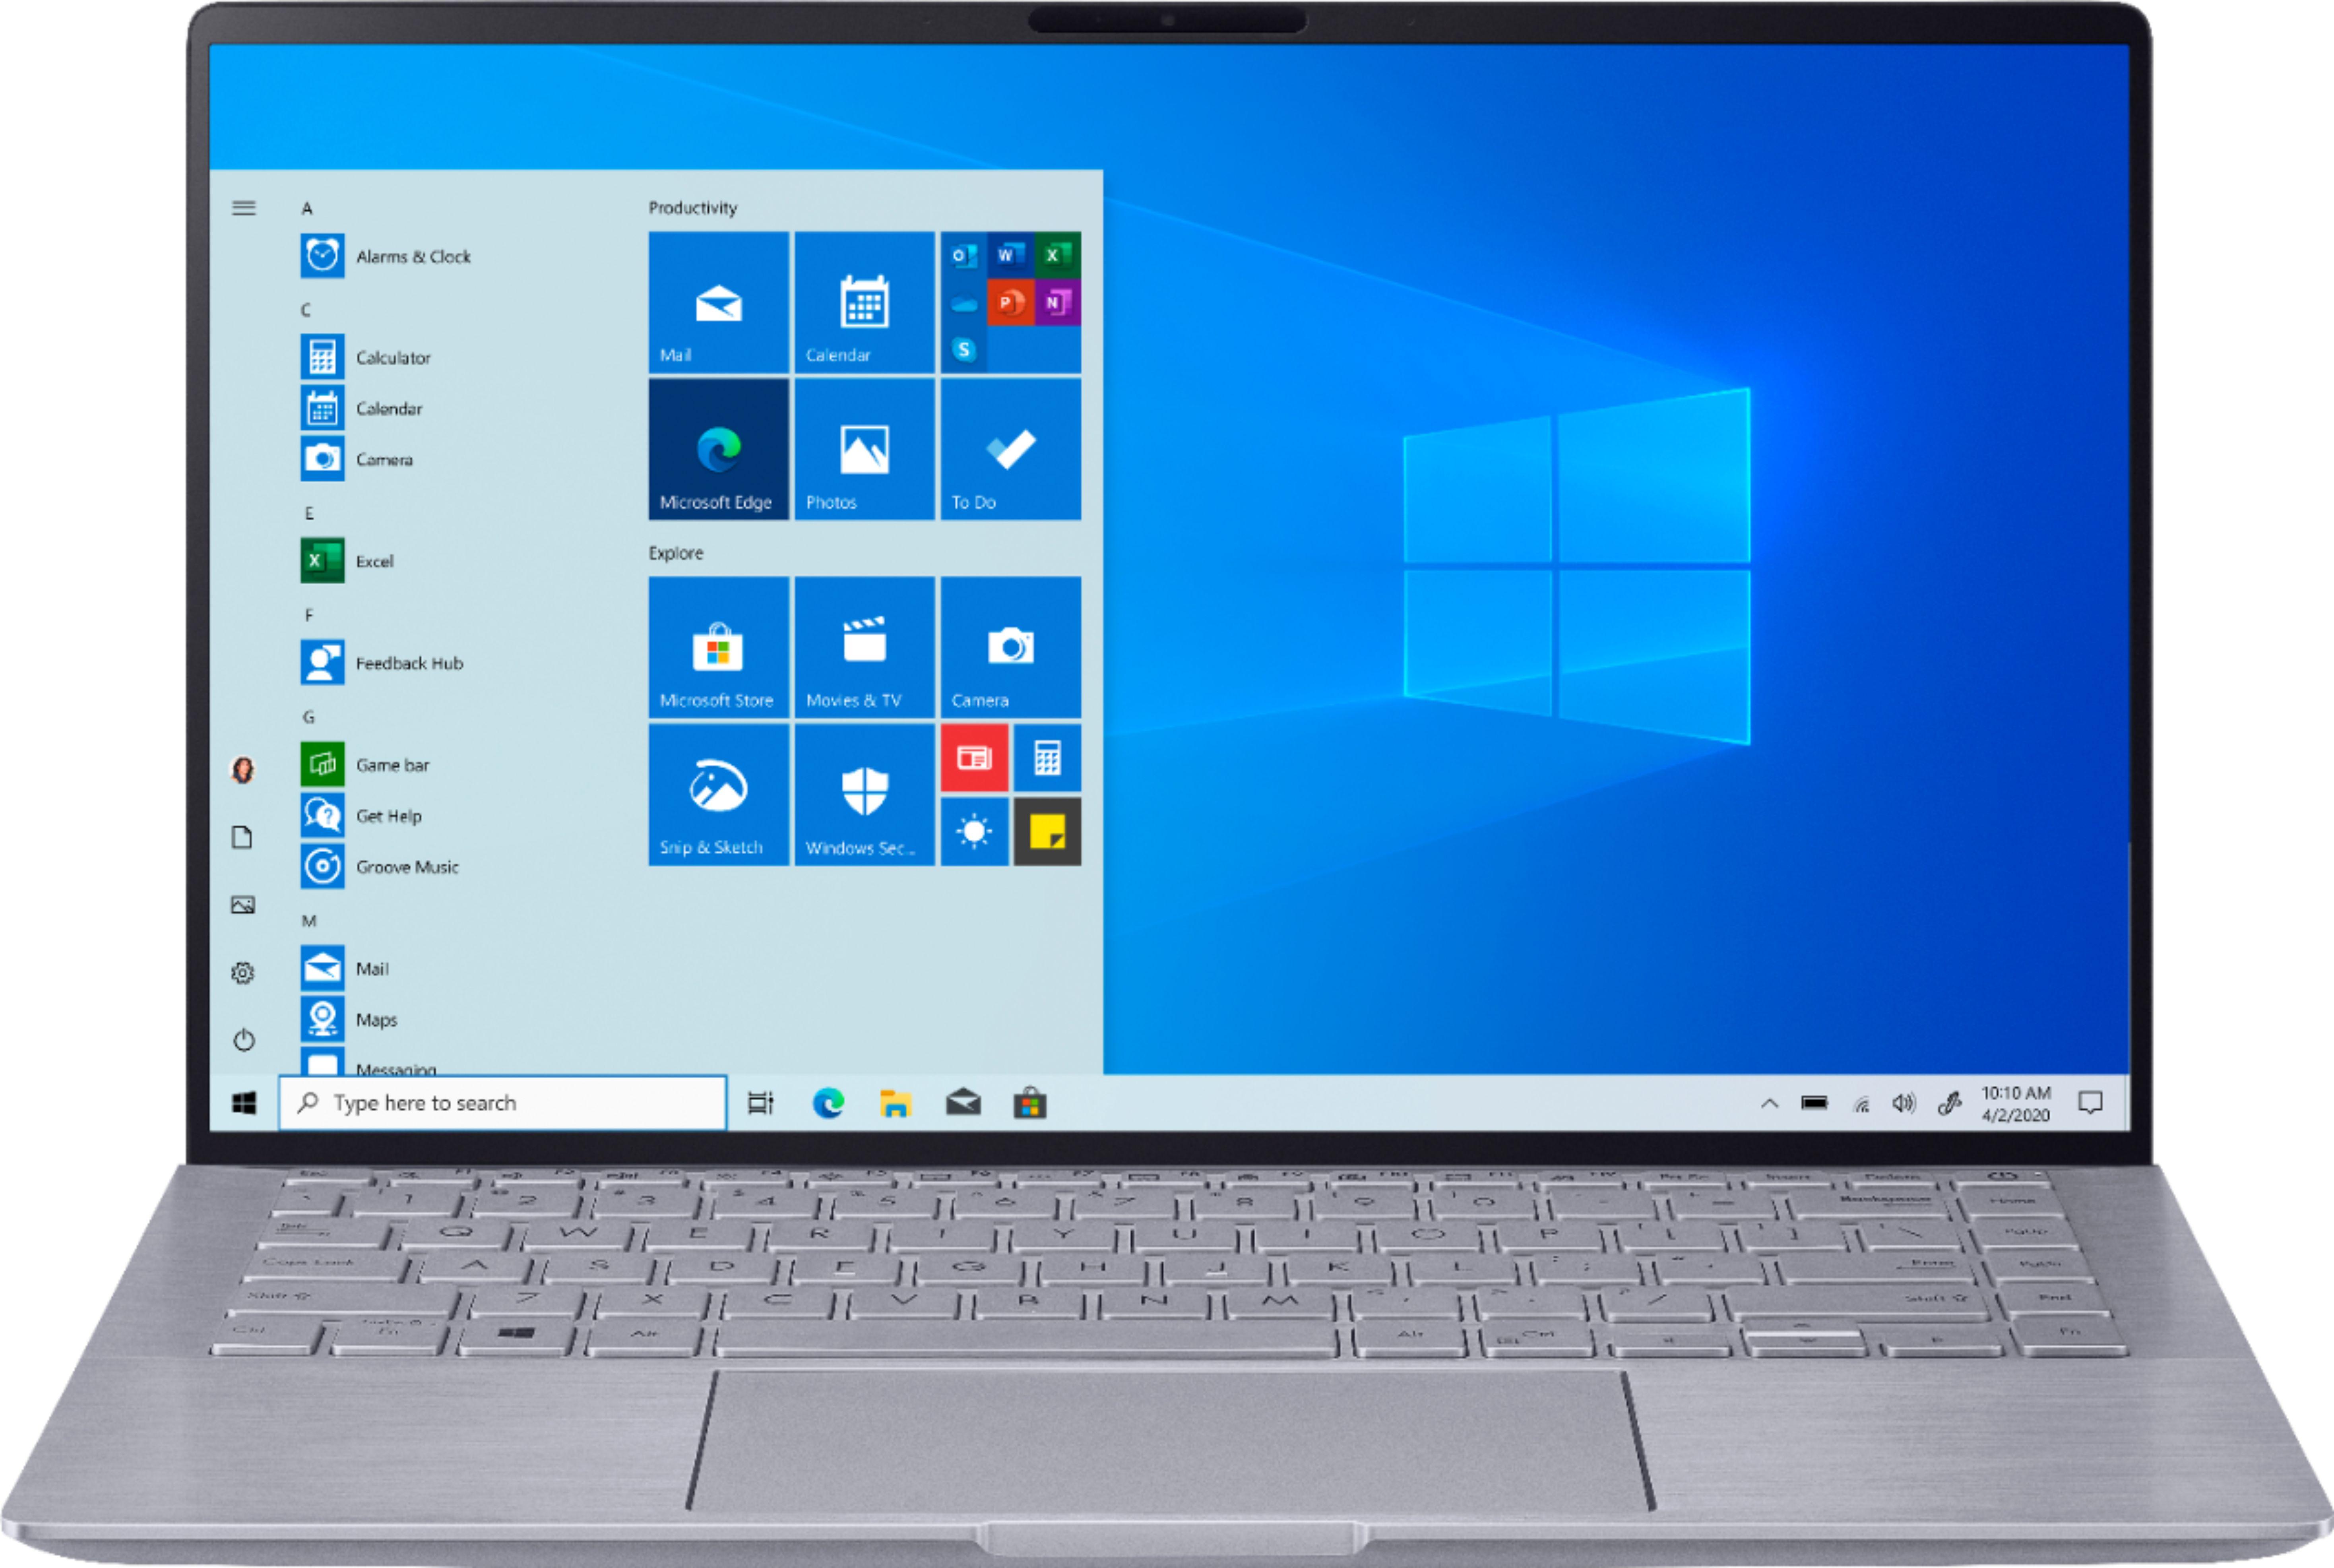 "Asus Zenbook Laptop: Ryzen 5 4500U, 14"" 1080p, 8GB RAM, 256GB SSD, MX350, Win 10 $599.99 + Free Shipping @ Best Buy"